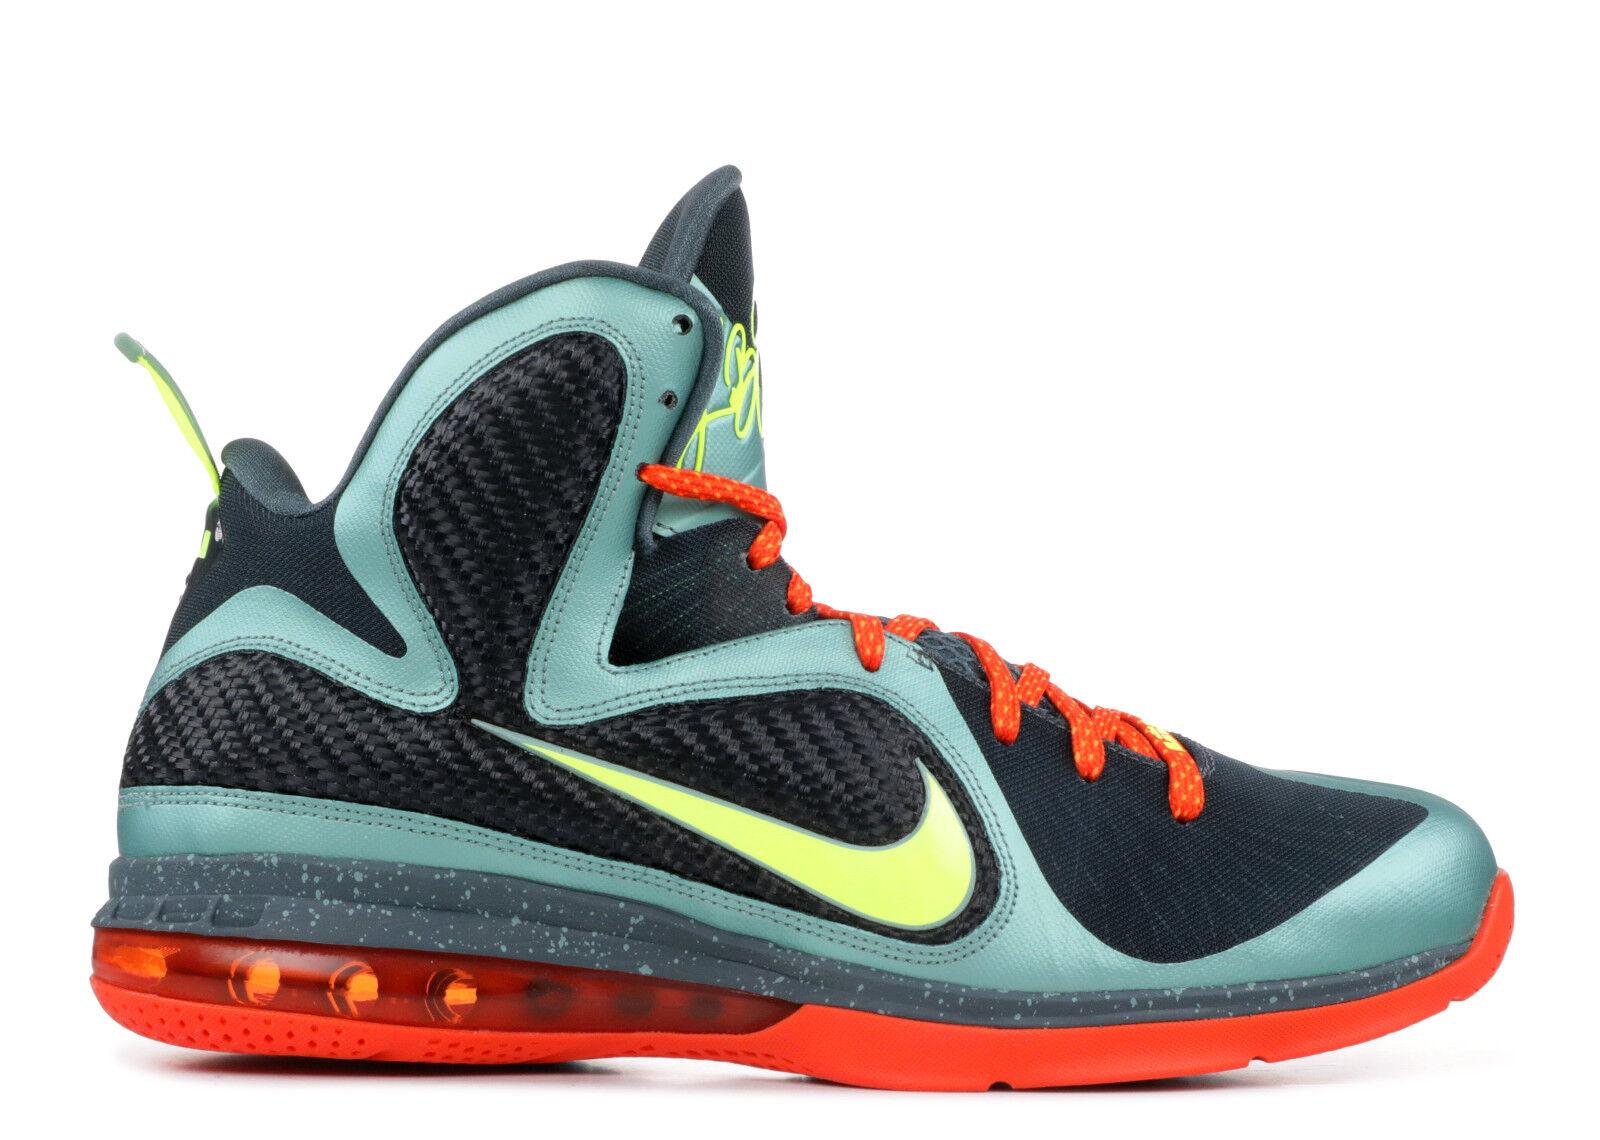 Nike lebron 9 cannoni di dimensioni 469764-004 ix